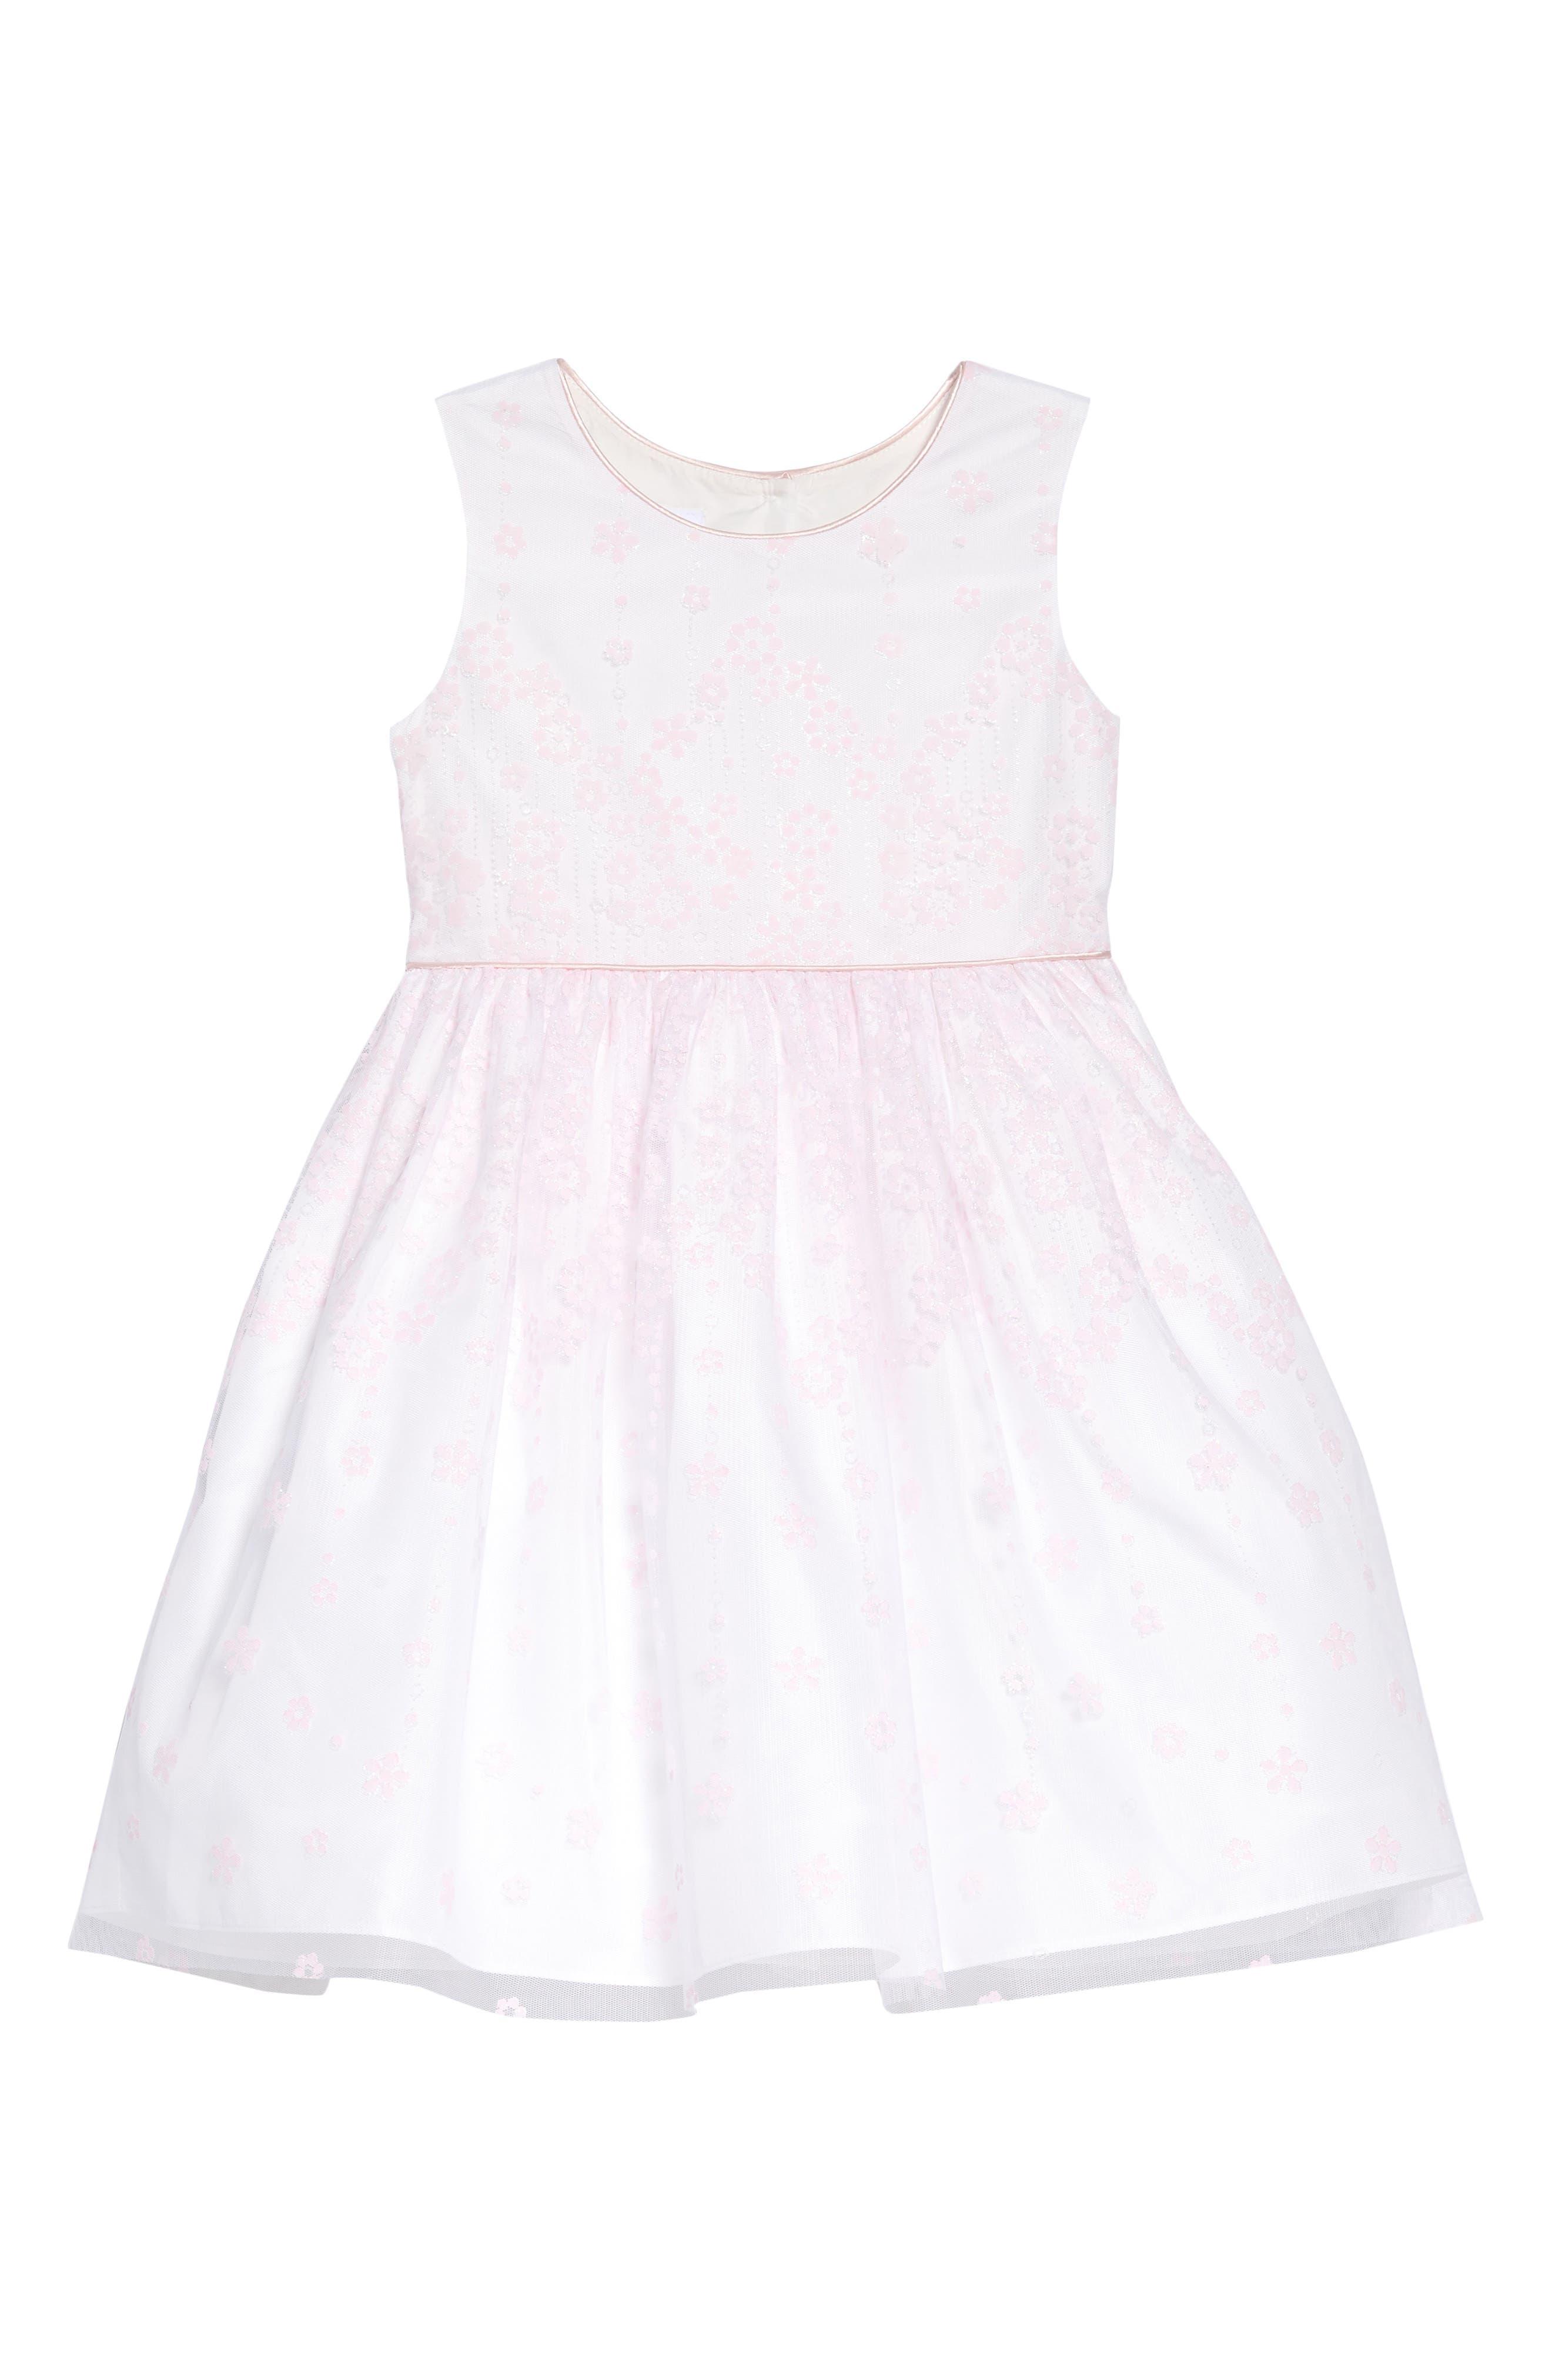 FRAIS, Flower Glitter Fit & Flare Dress, Main thumbnail 1, color, PINK